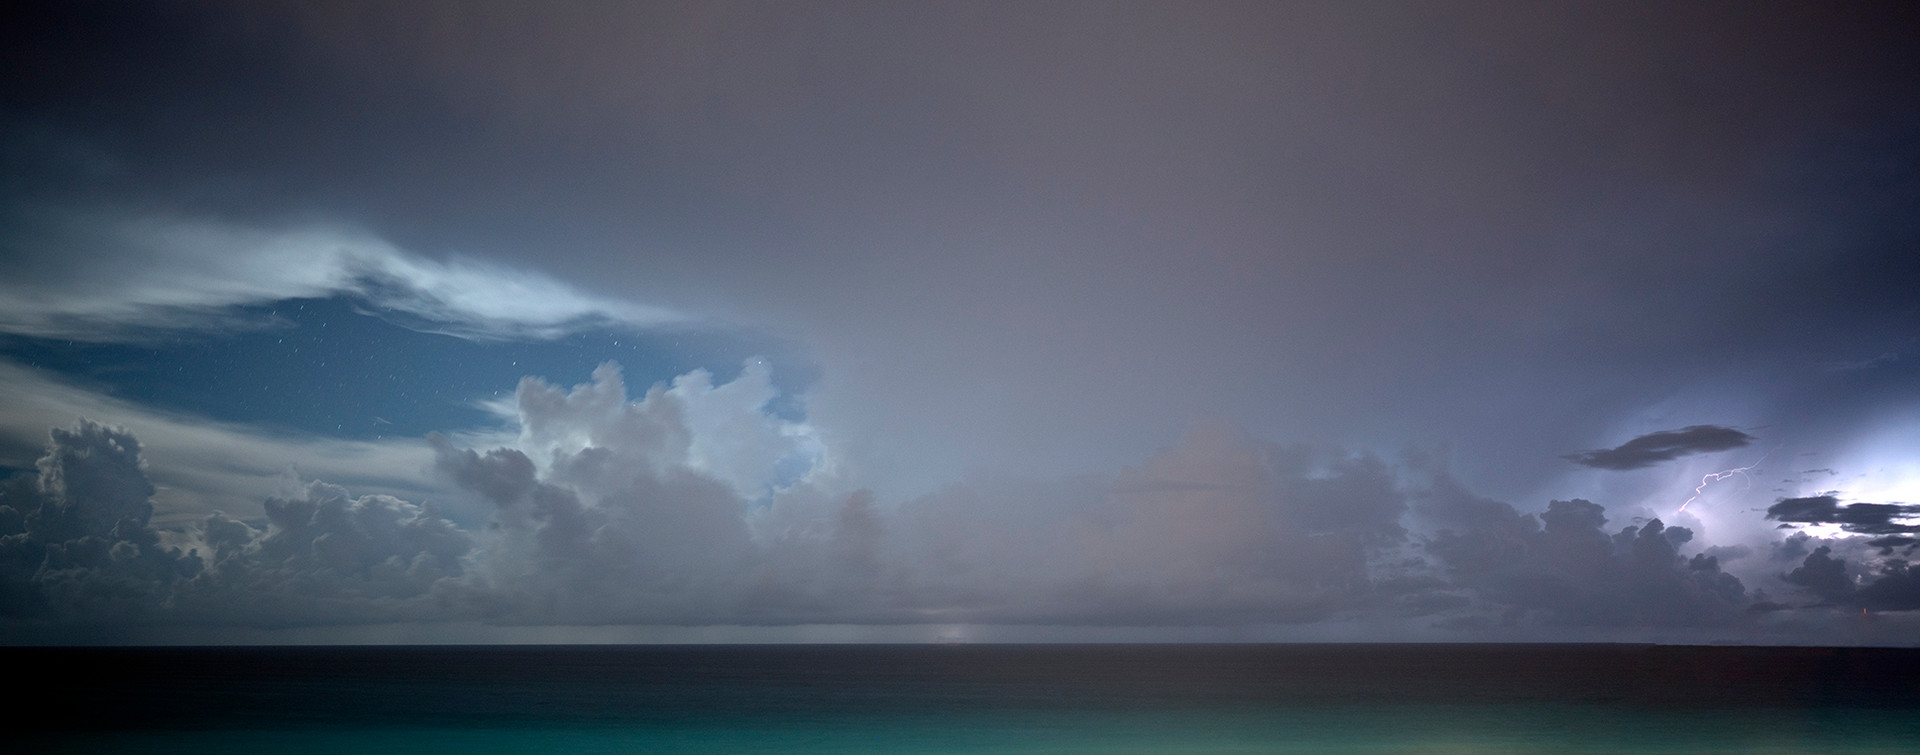 Cancún Tropical Storm